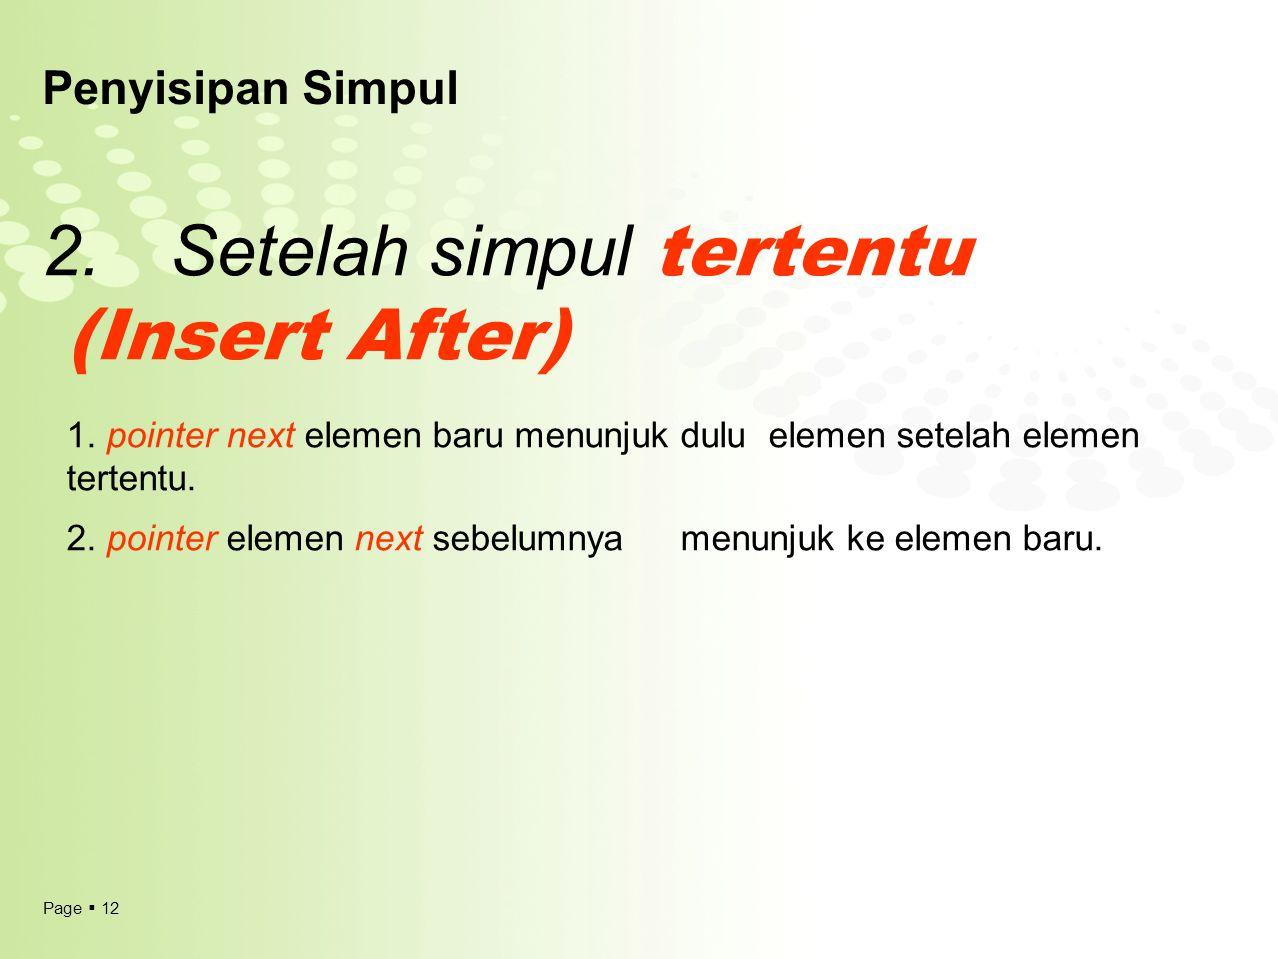 2. Setelah simpul tertentu (Insert After)